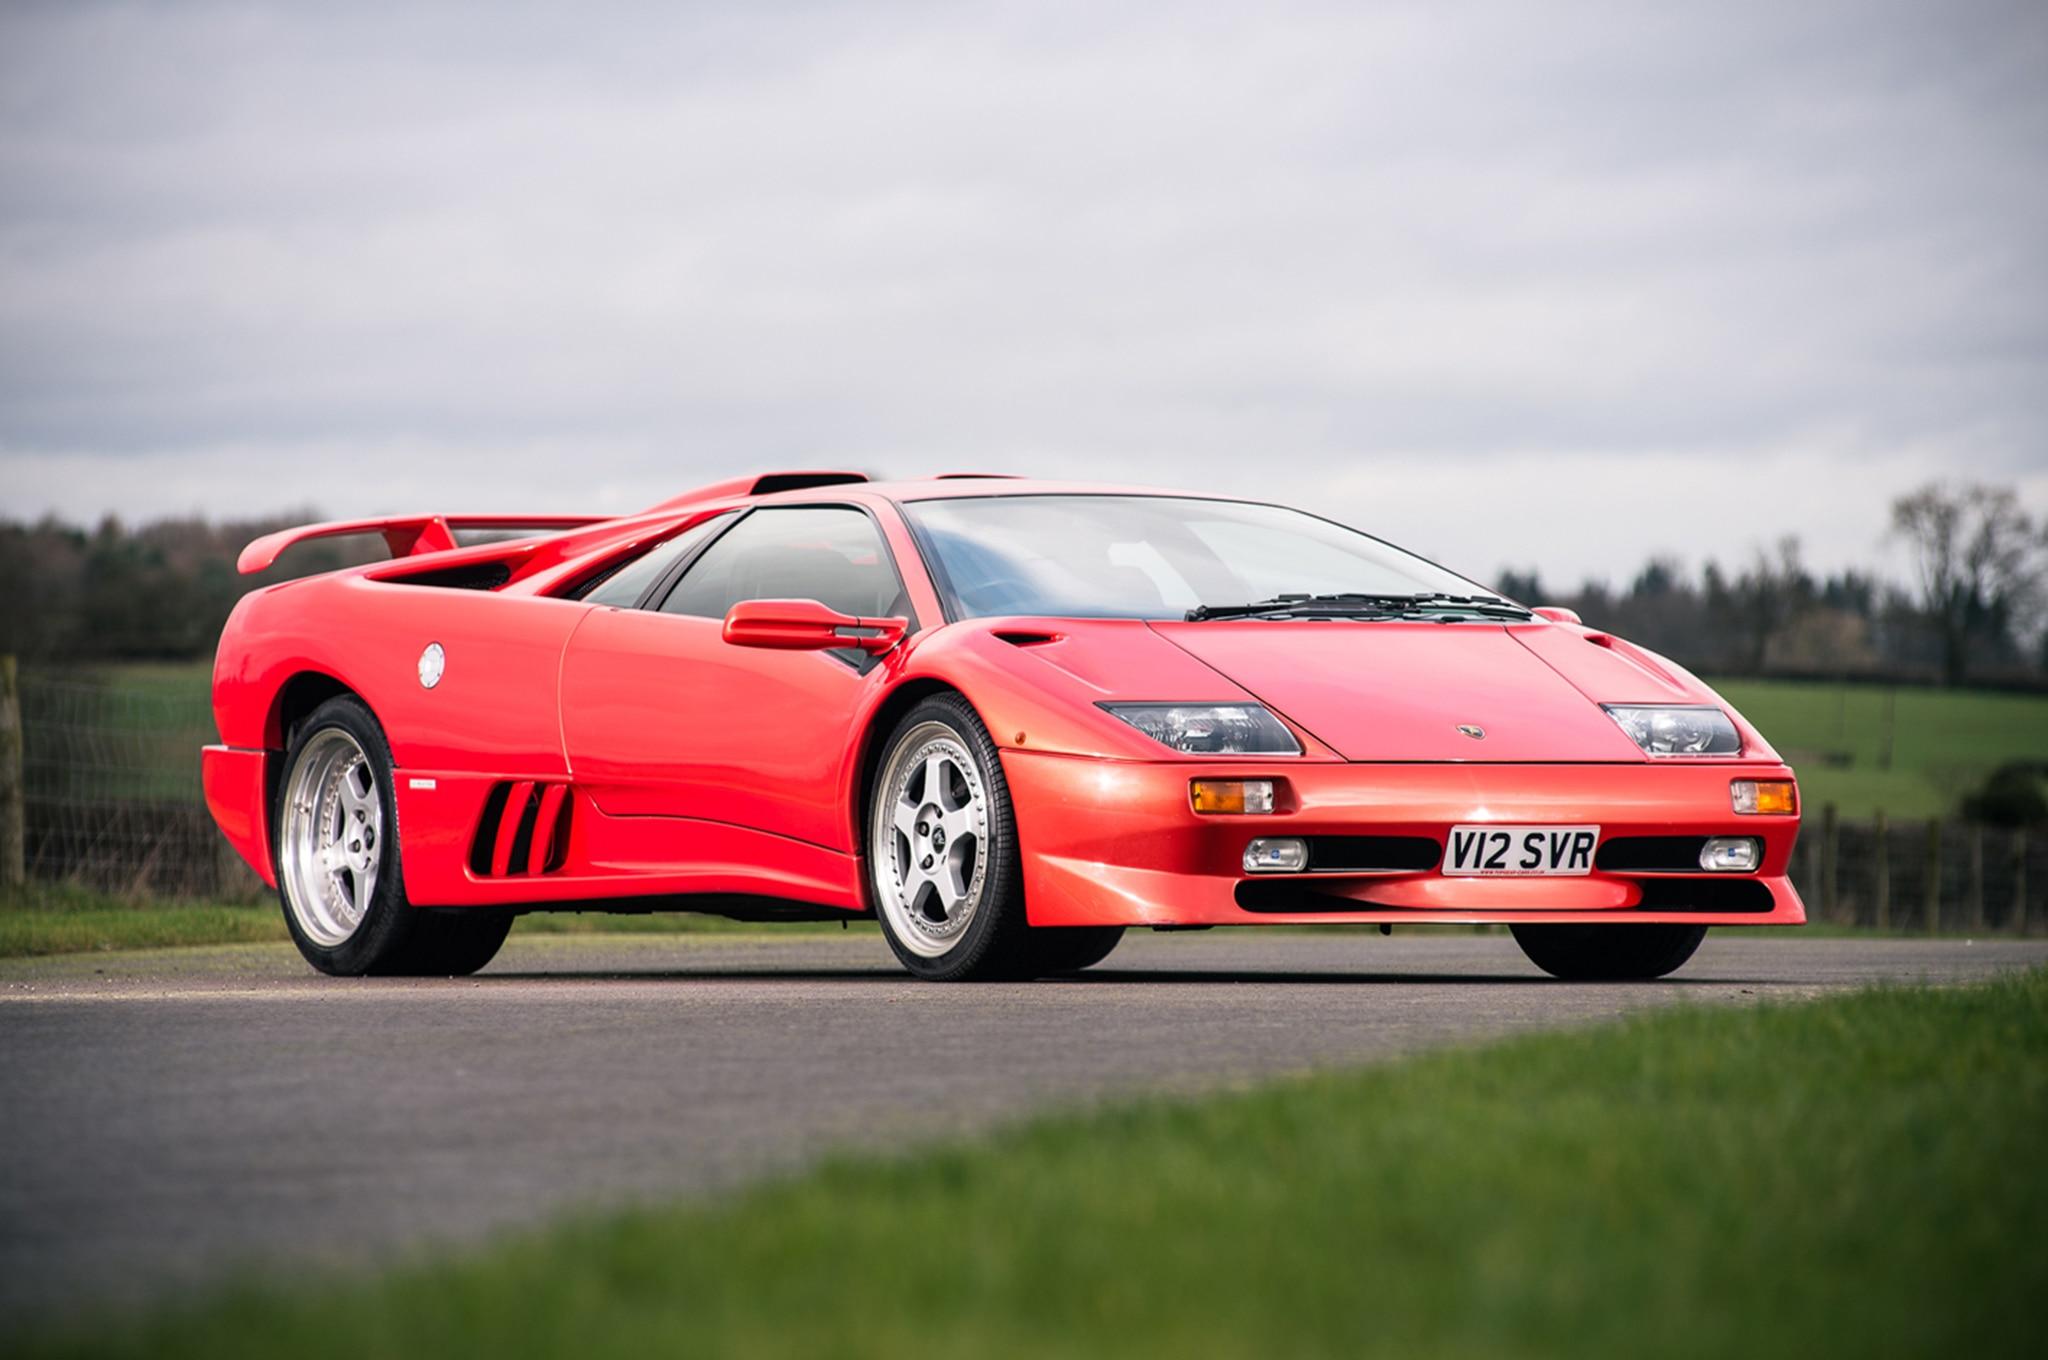 Last Pre Vw Era Lamborghini Diablo Sv Headed To Auction